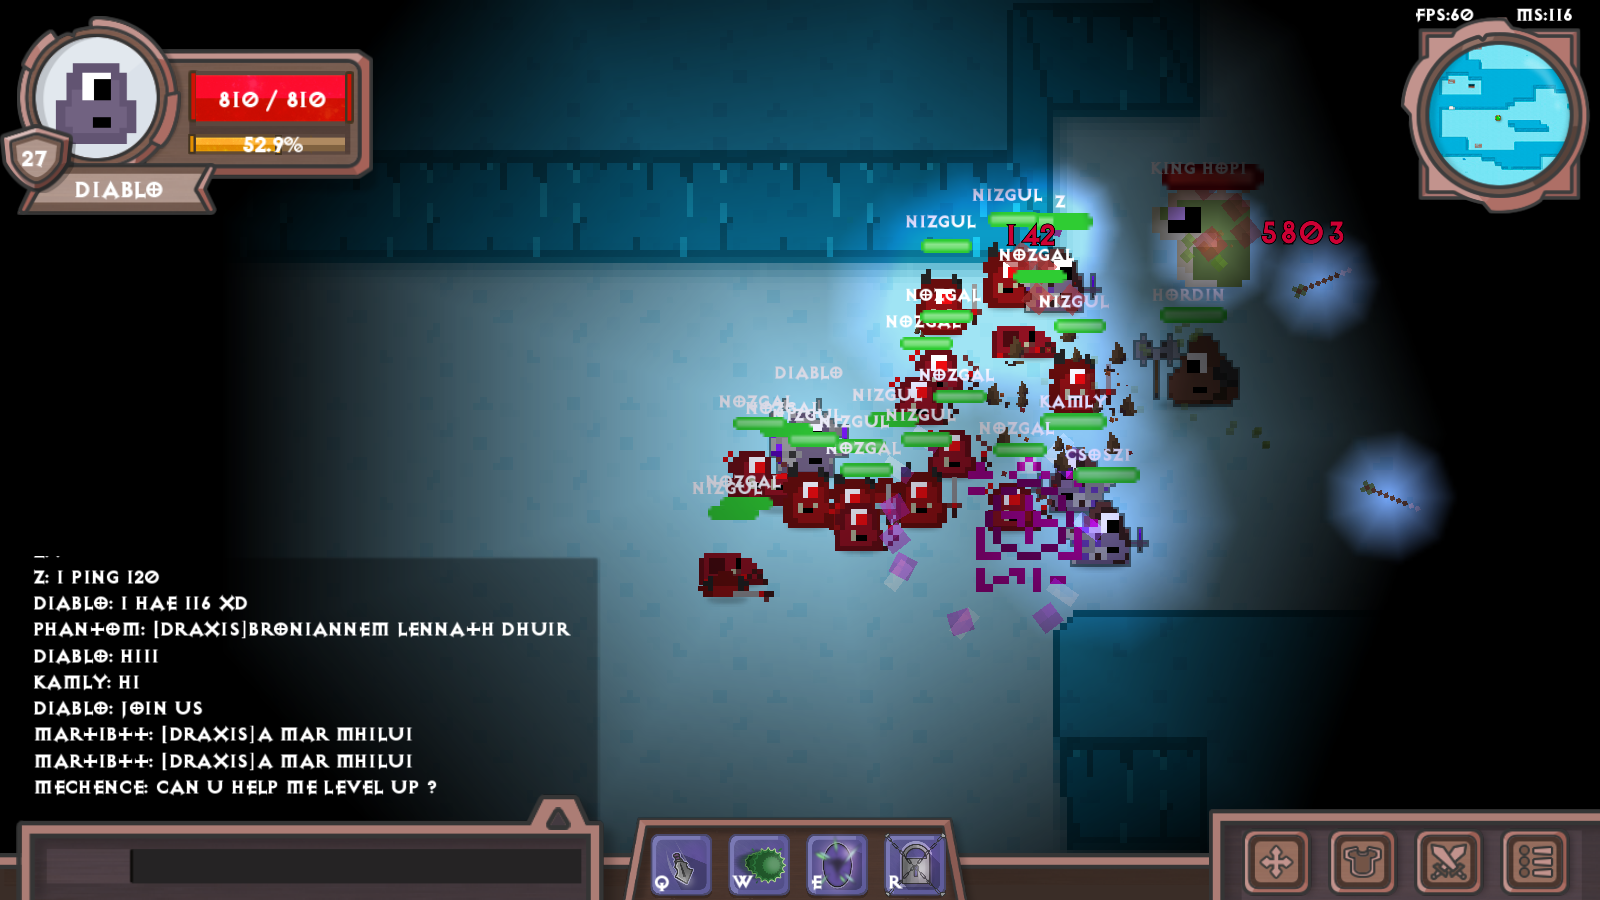 Alpha: Little War Online [MMORPG] by Mobile Co Studios